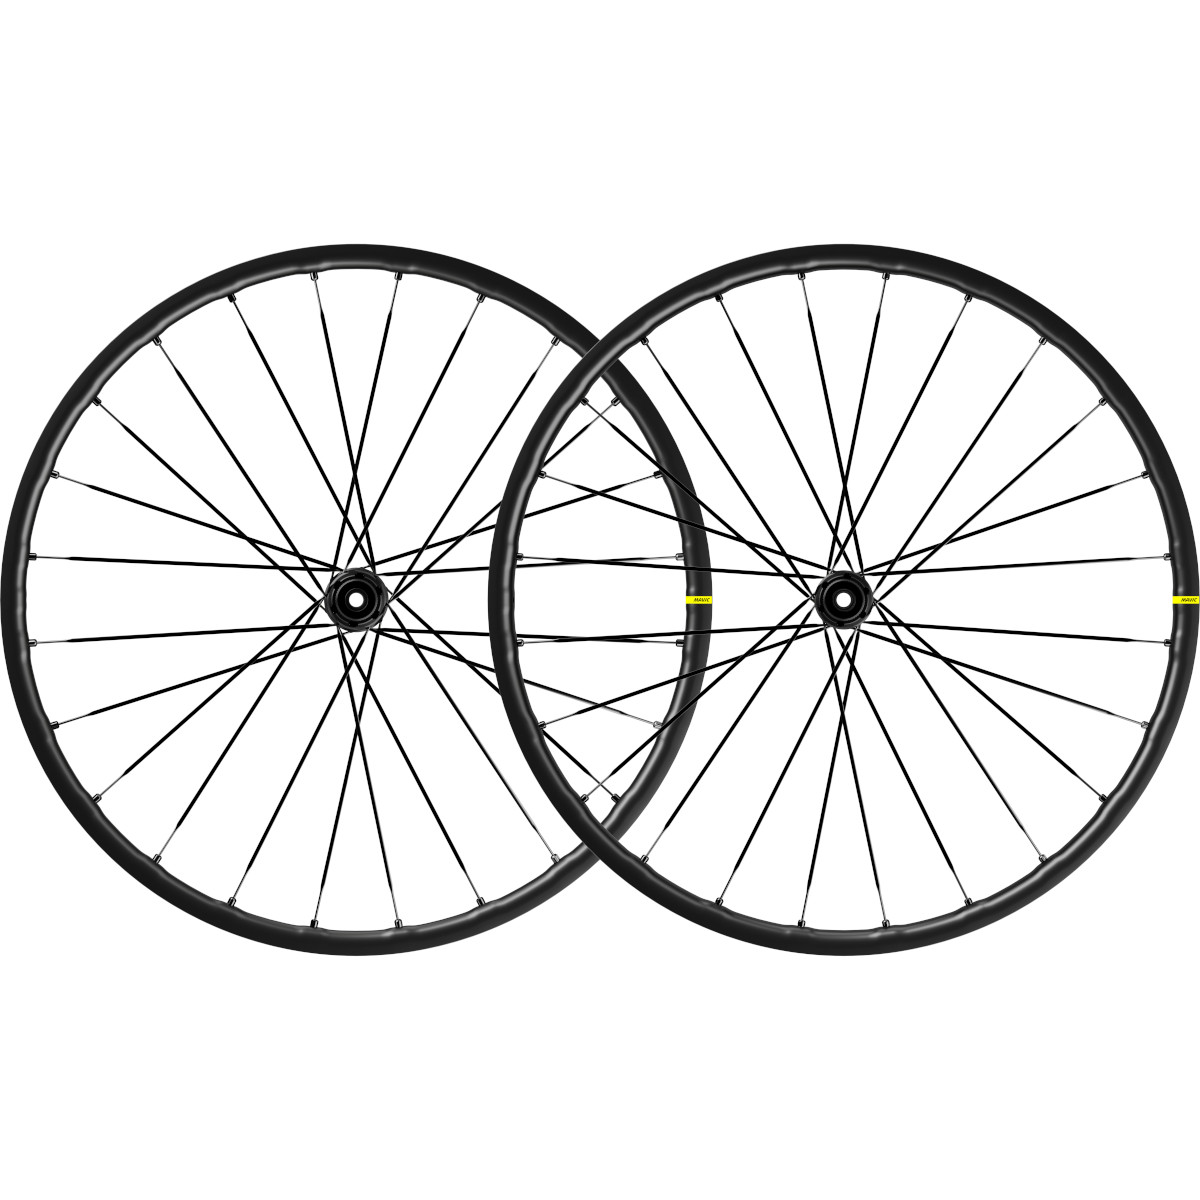 Mavic Allroad SL Road+ 650B UST Laufradsatz - Centerlock - VR: 12x100mm | HR: 12x142mm - Shimano HG